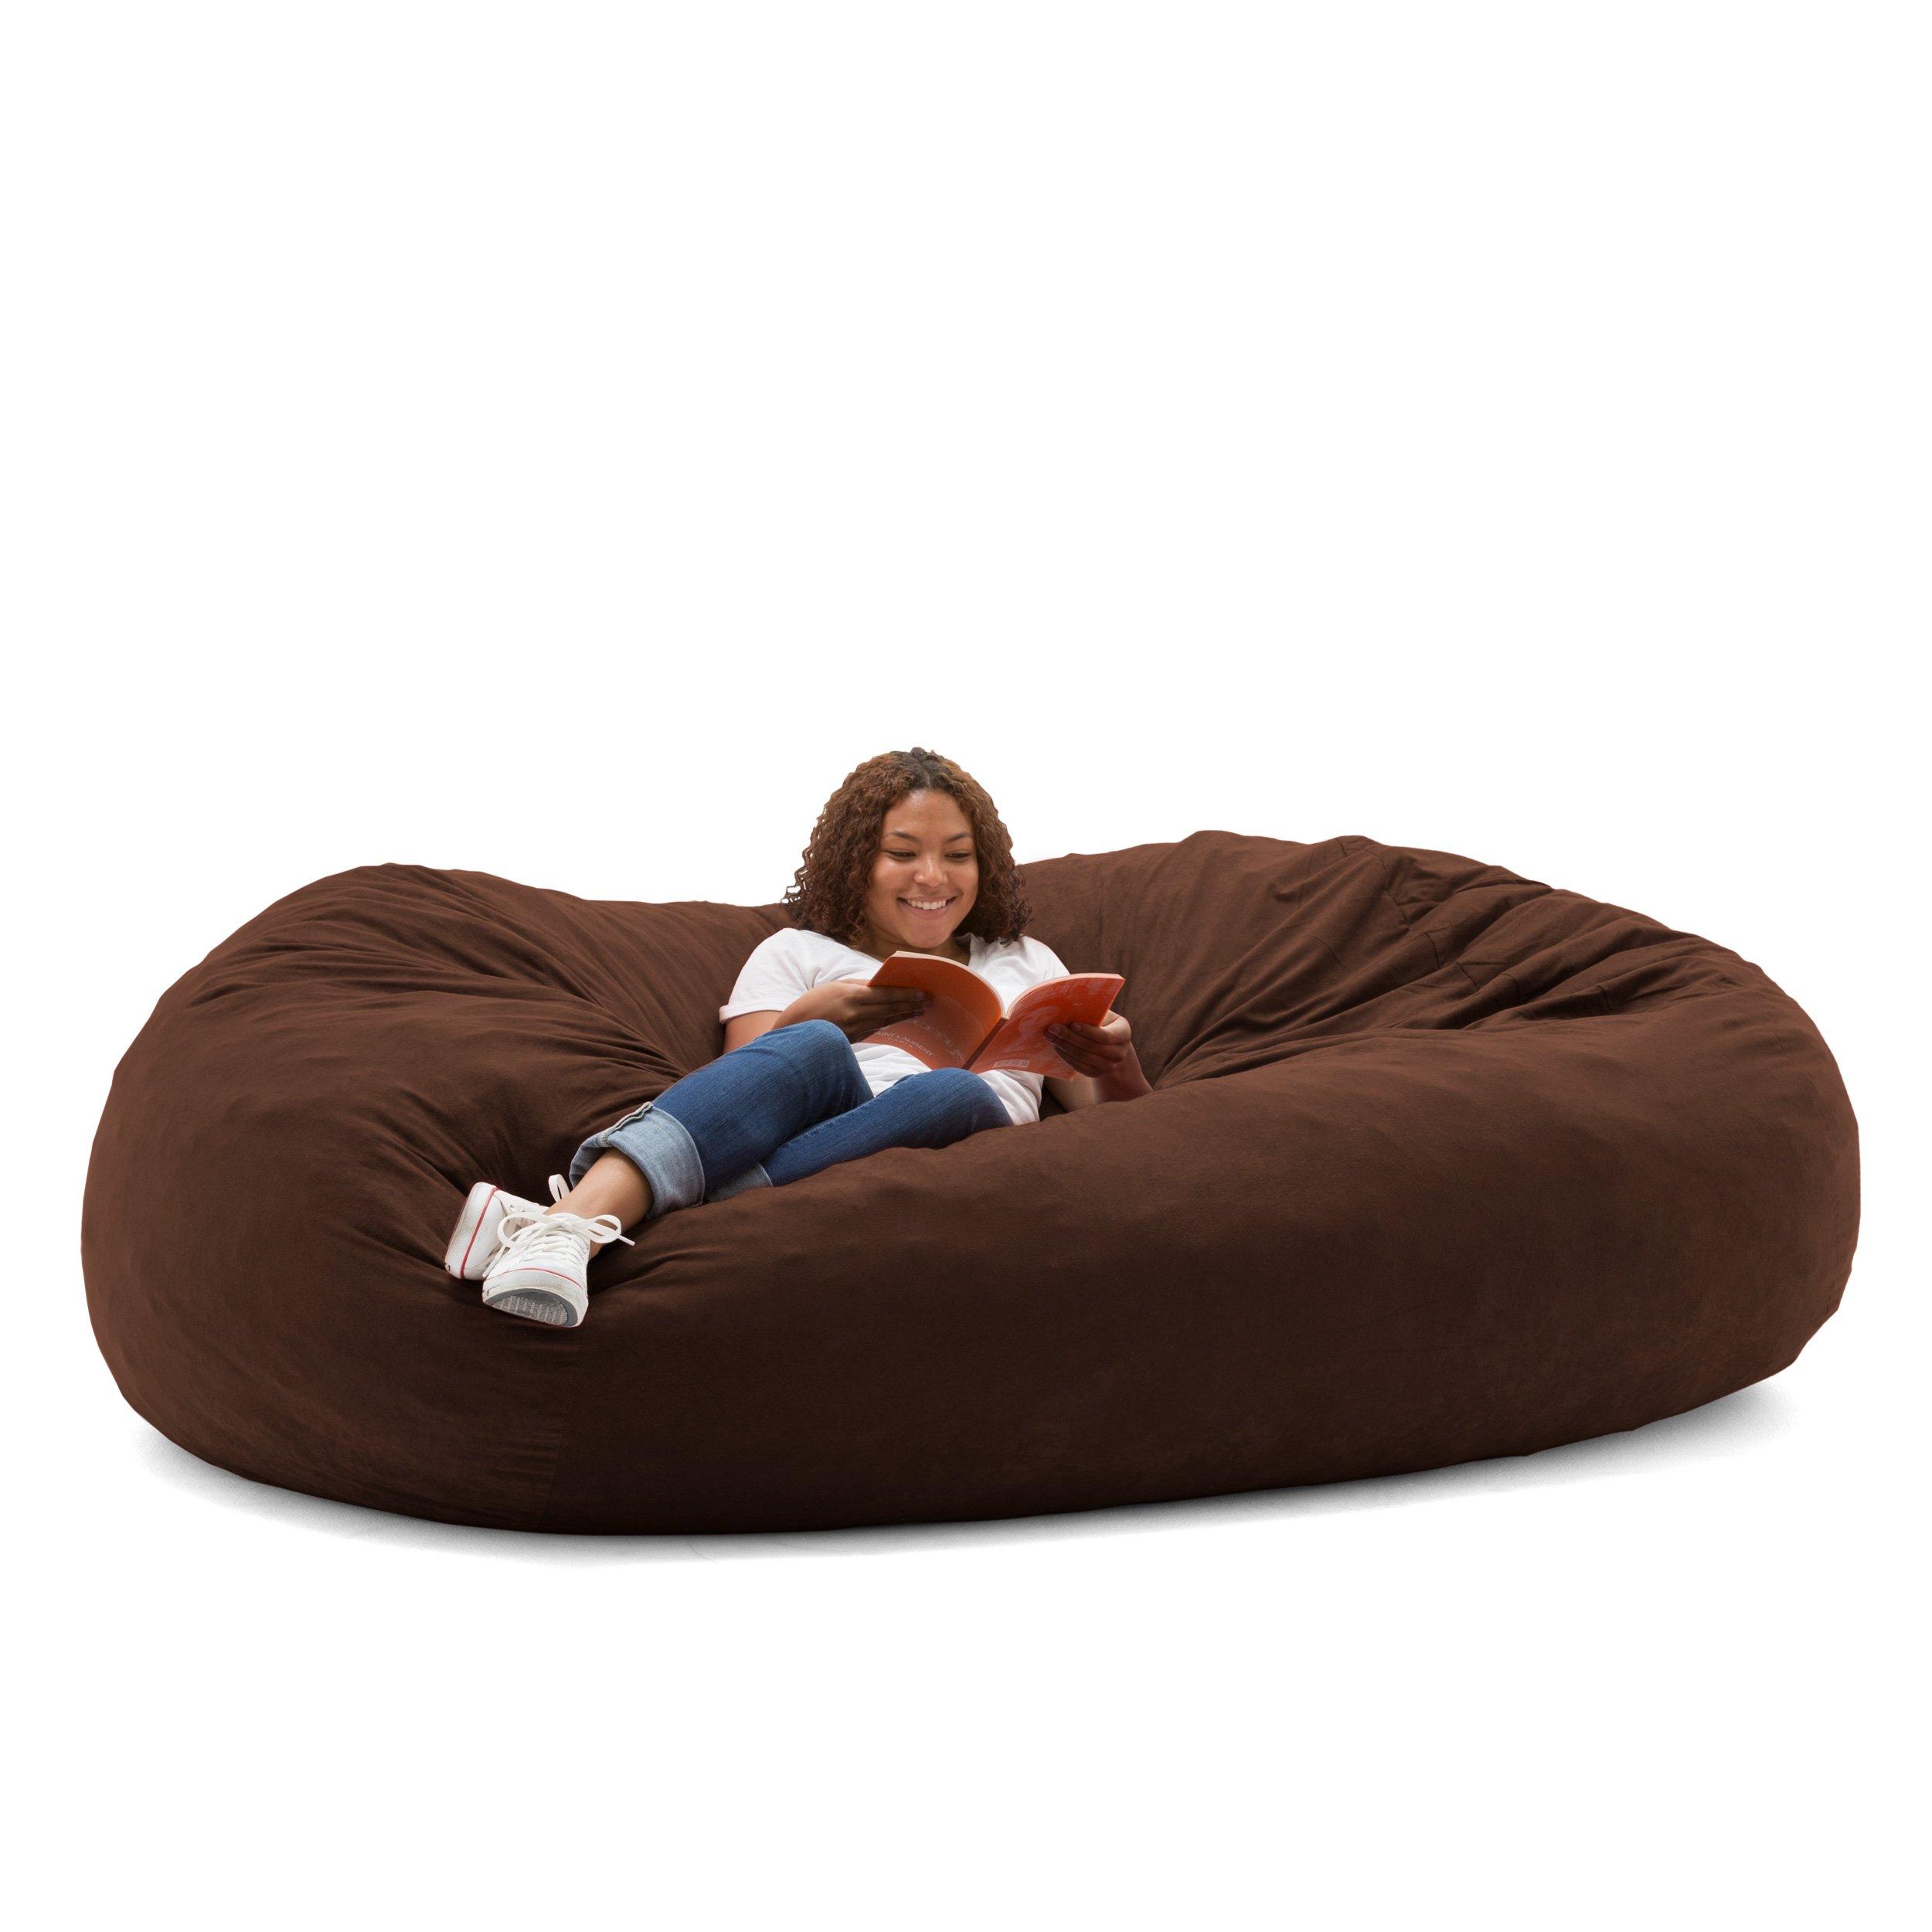 Big Joe XXL Fuf Foam Filled Bean Bag Chair, Comfort Suede, Espresso